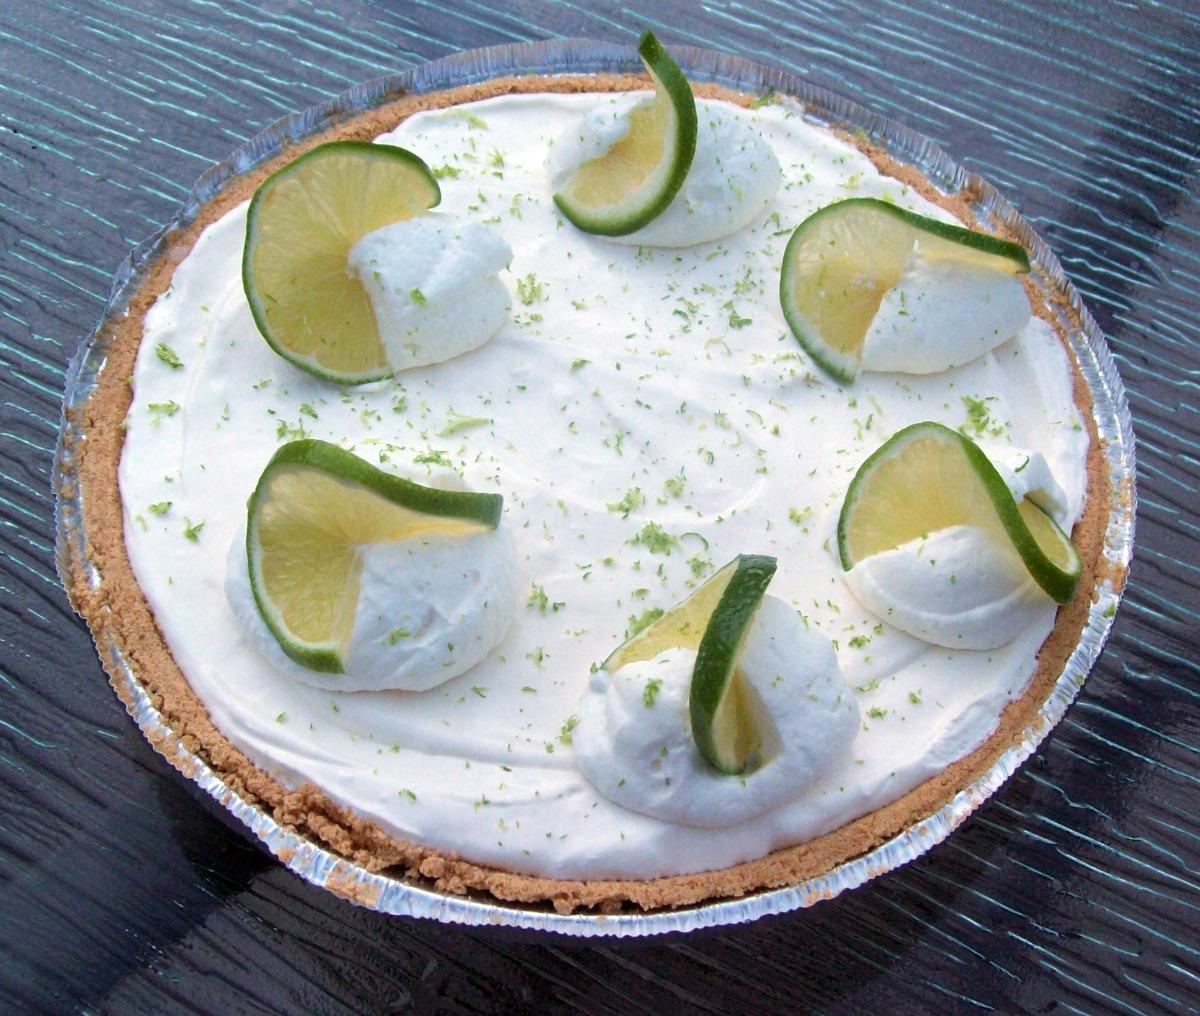 FishPrincessDesigns Welcome Friends!: Frozen Key Lime Pie